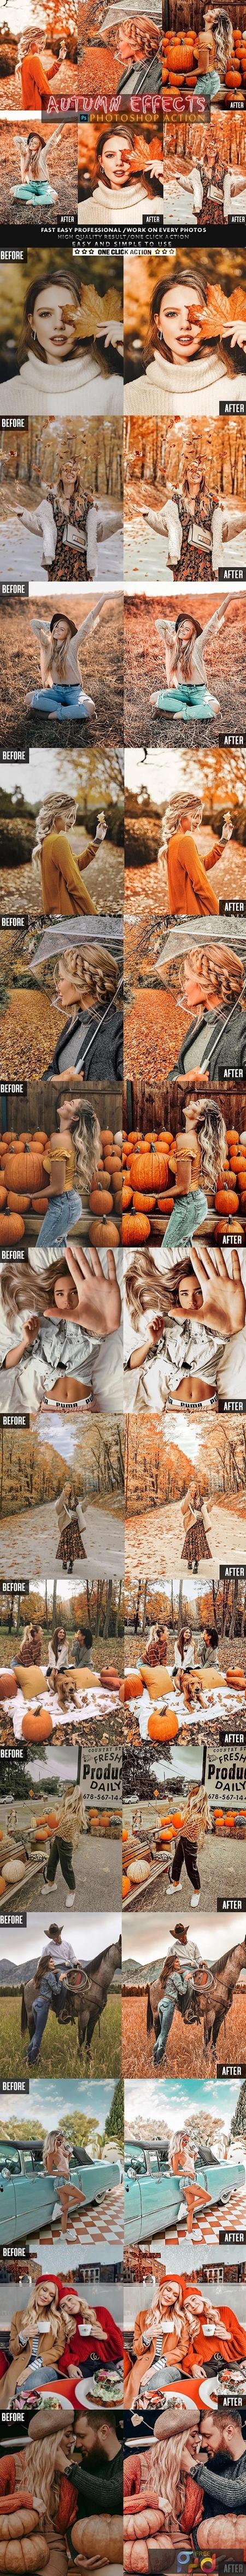 Autumn Photoshop Action 24778782 1